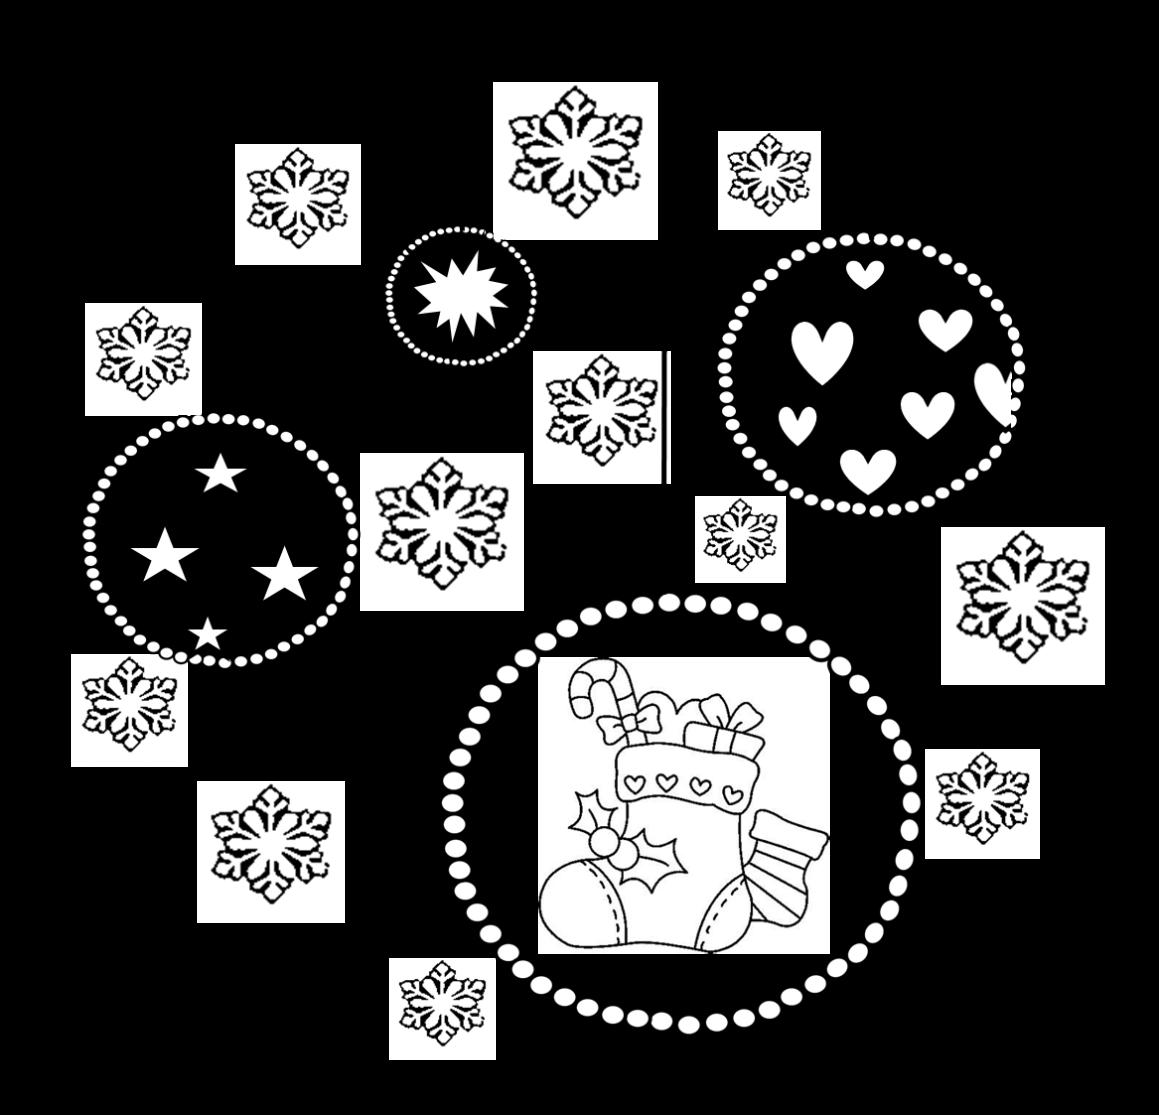 Coloriages Mandalas De Noel Recreatisse